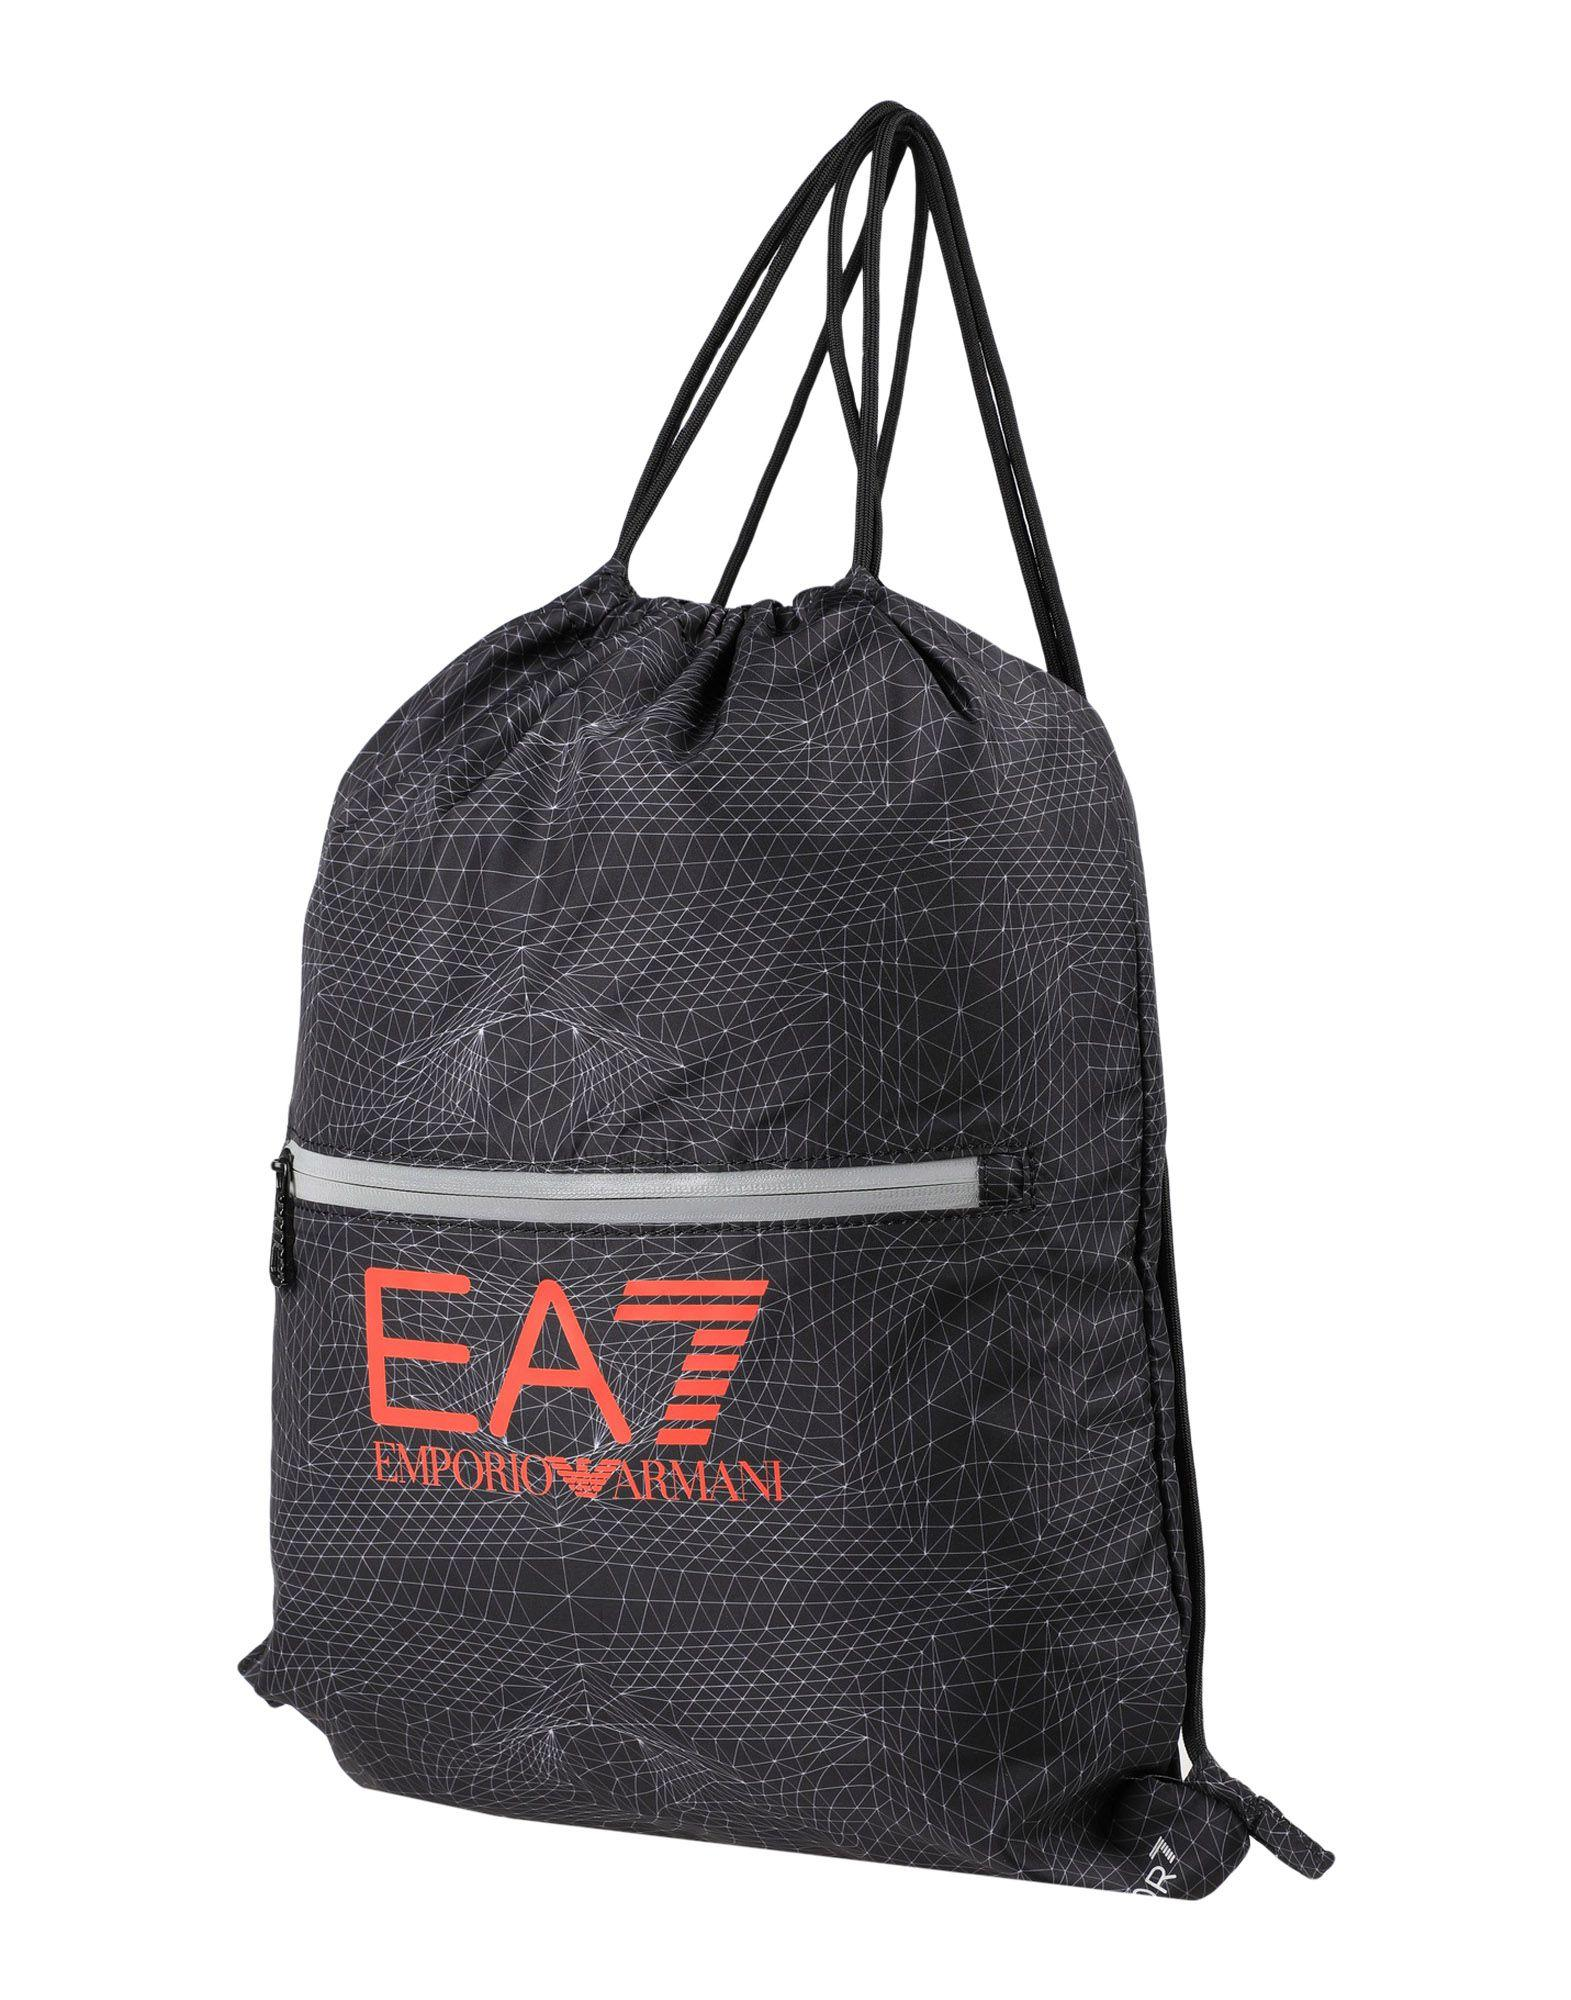 Ea7 Backpack & Fanny Pack In Dark Blue